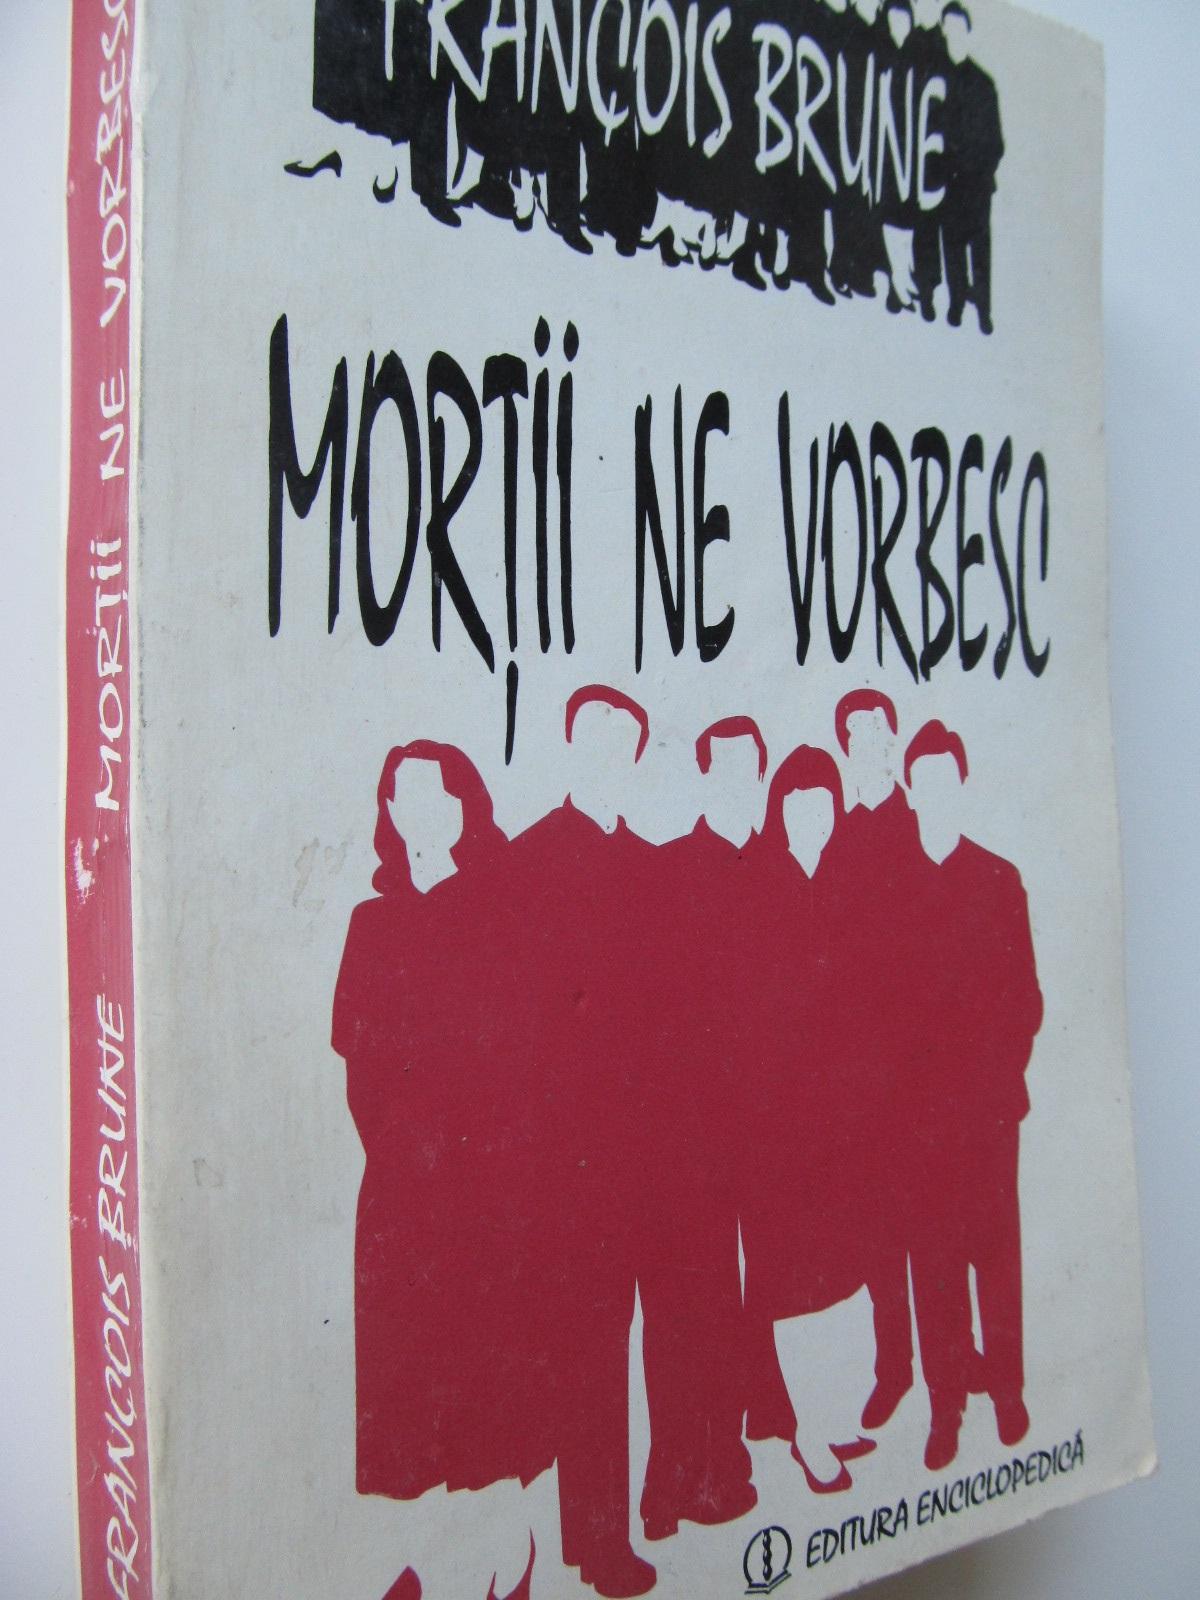 Mortii ne vorbesc - Francois Brune | Detalii carte